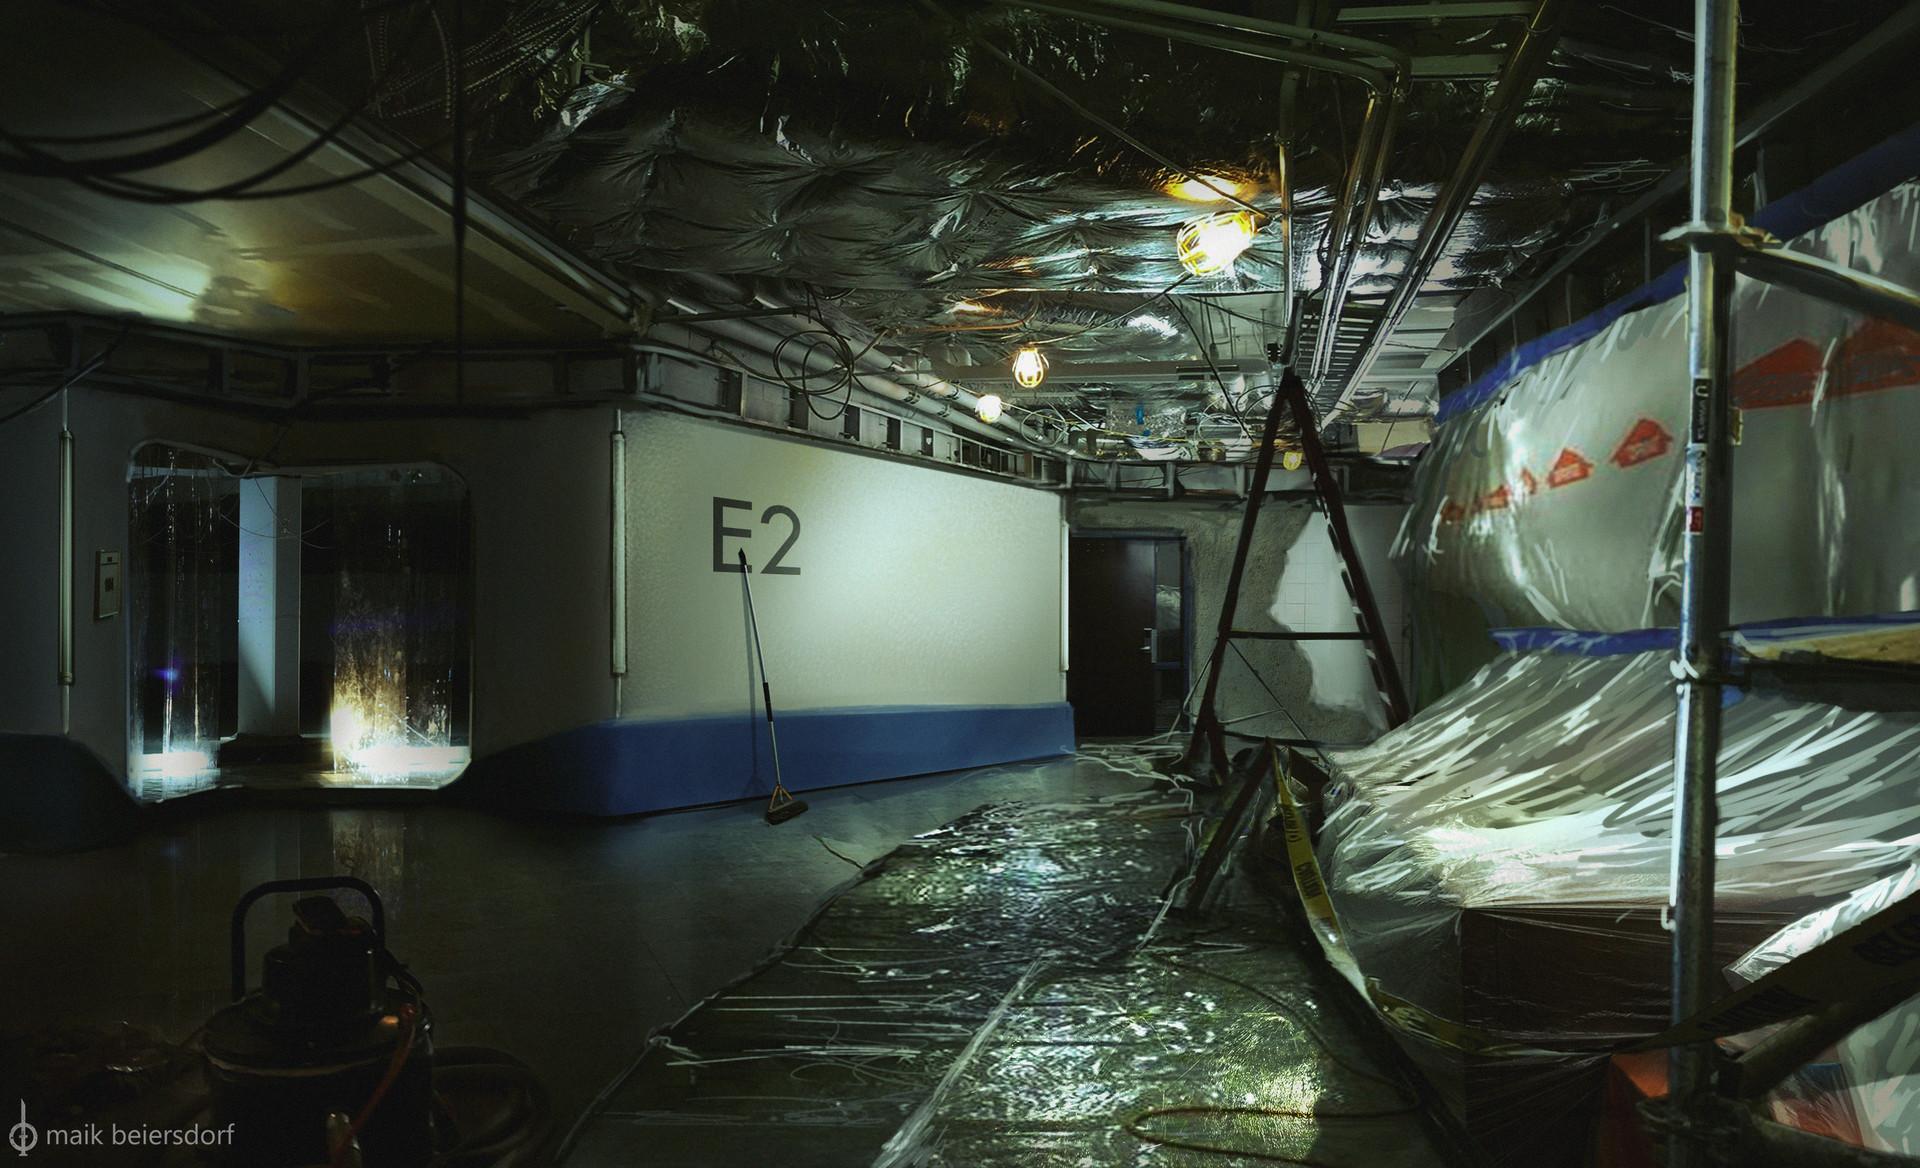 Maik beiersdorf unifase hallway restauration